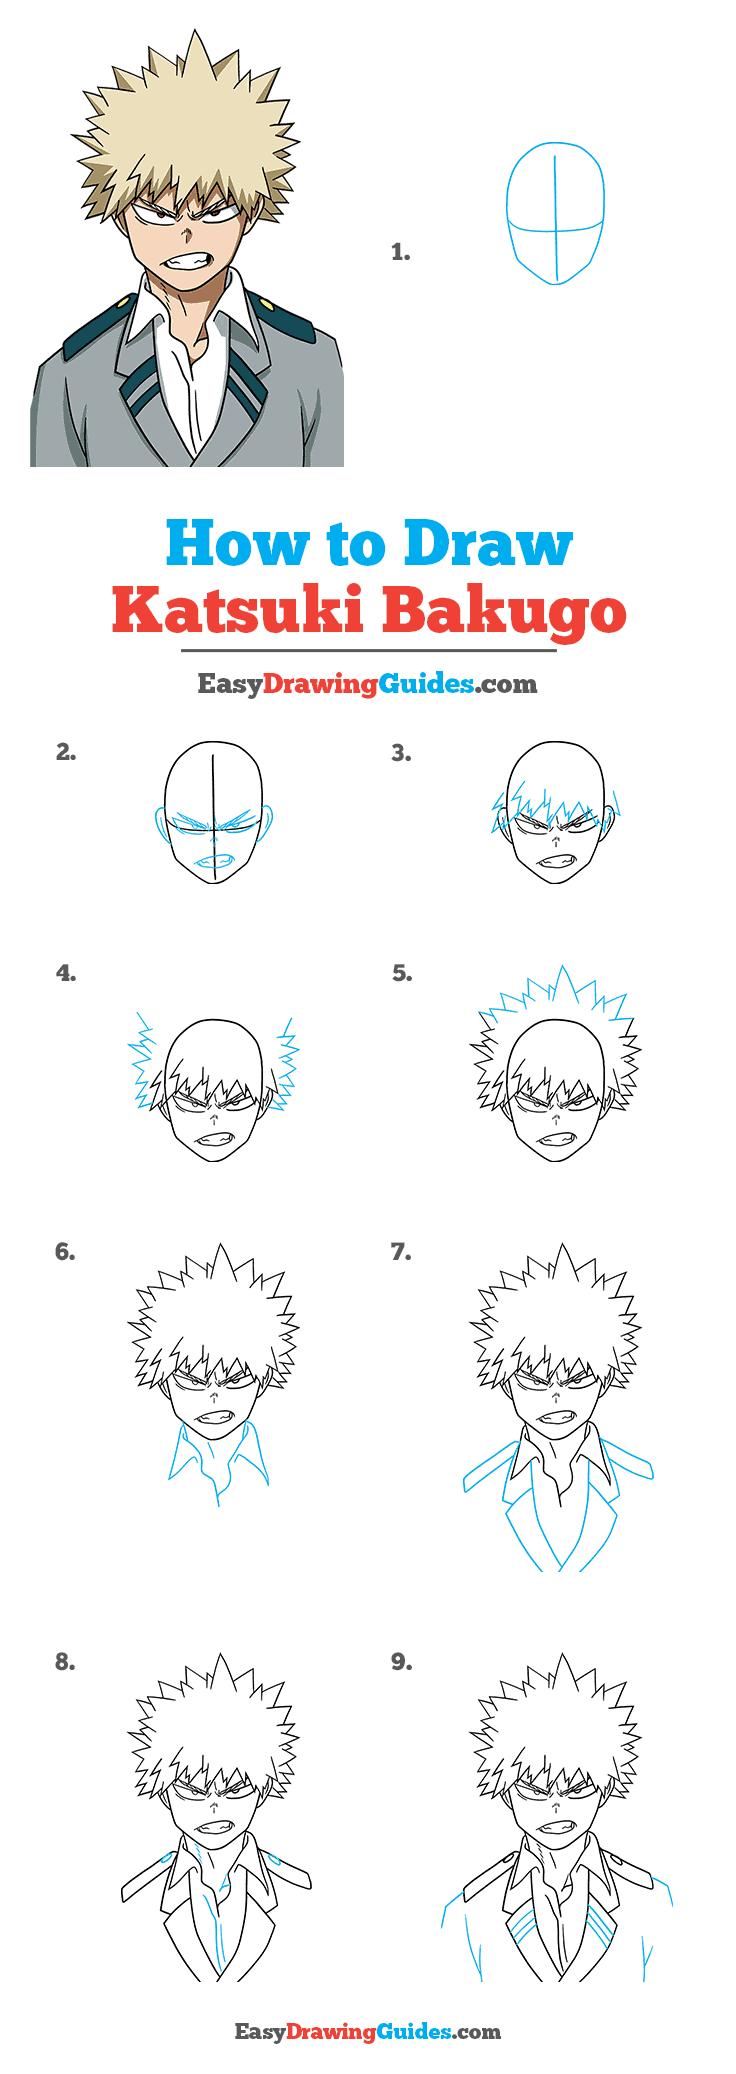 How to Draw Katsuki Bakugo